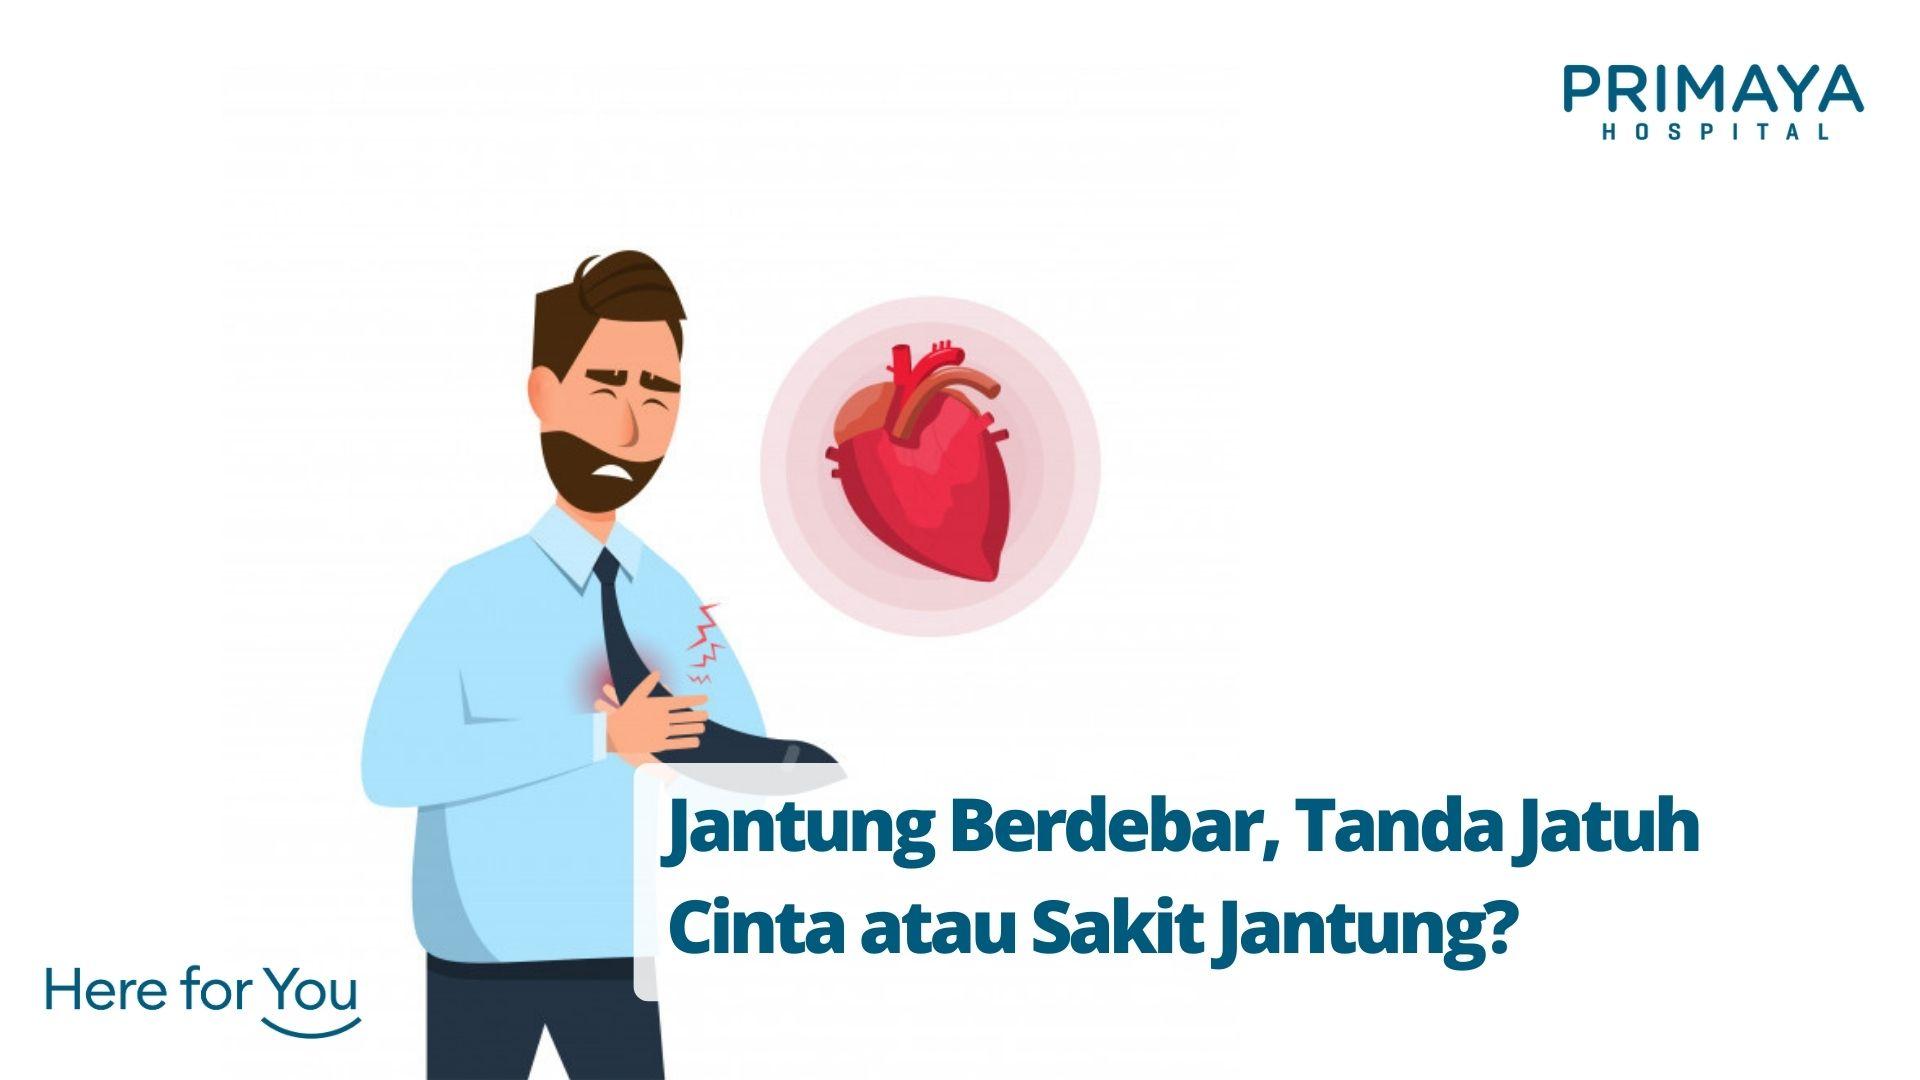 Jantung Berdebar, Tanda Jatuh Cinta atau Sakit Jantung_